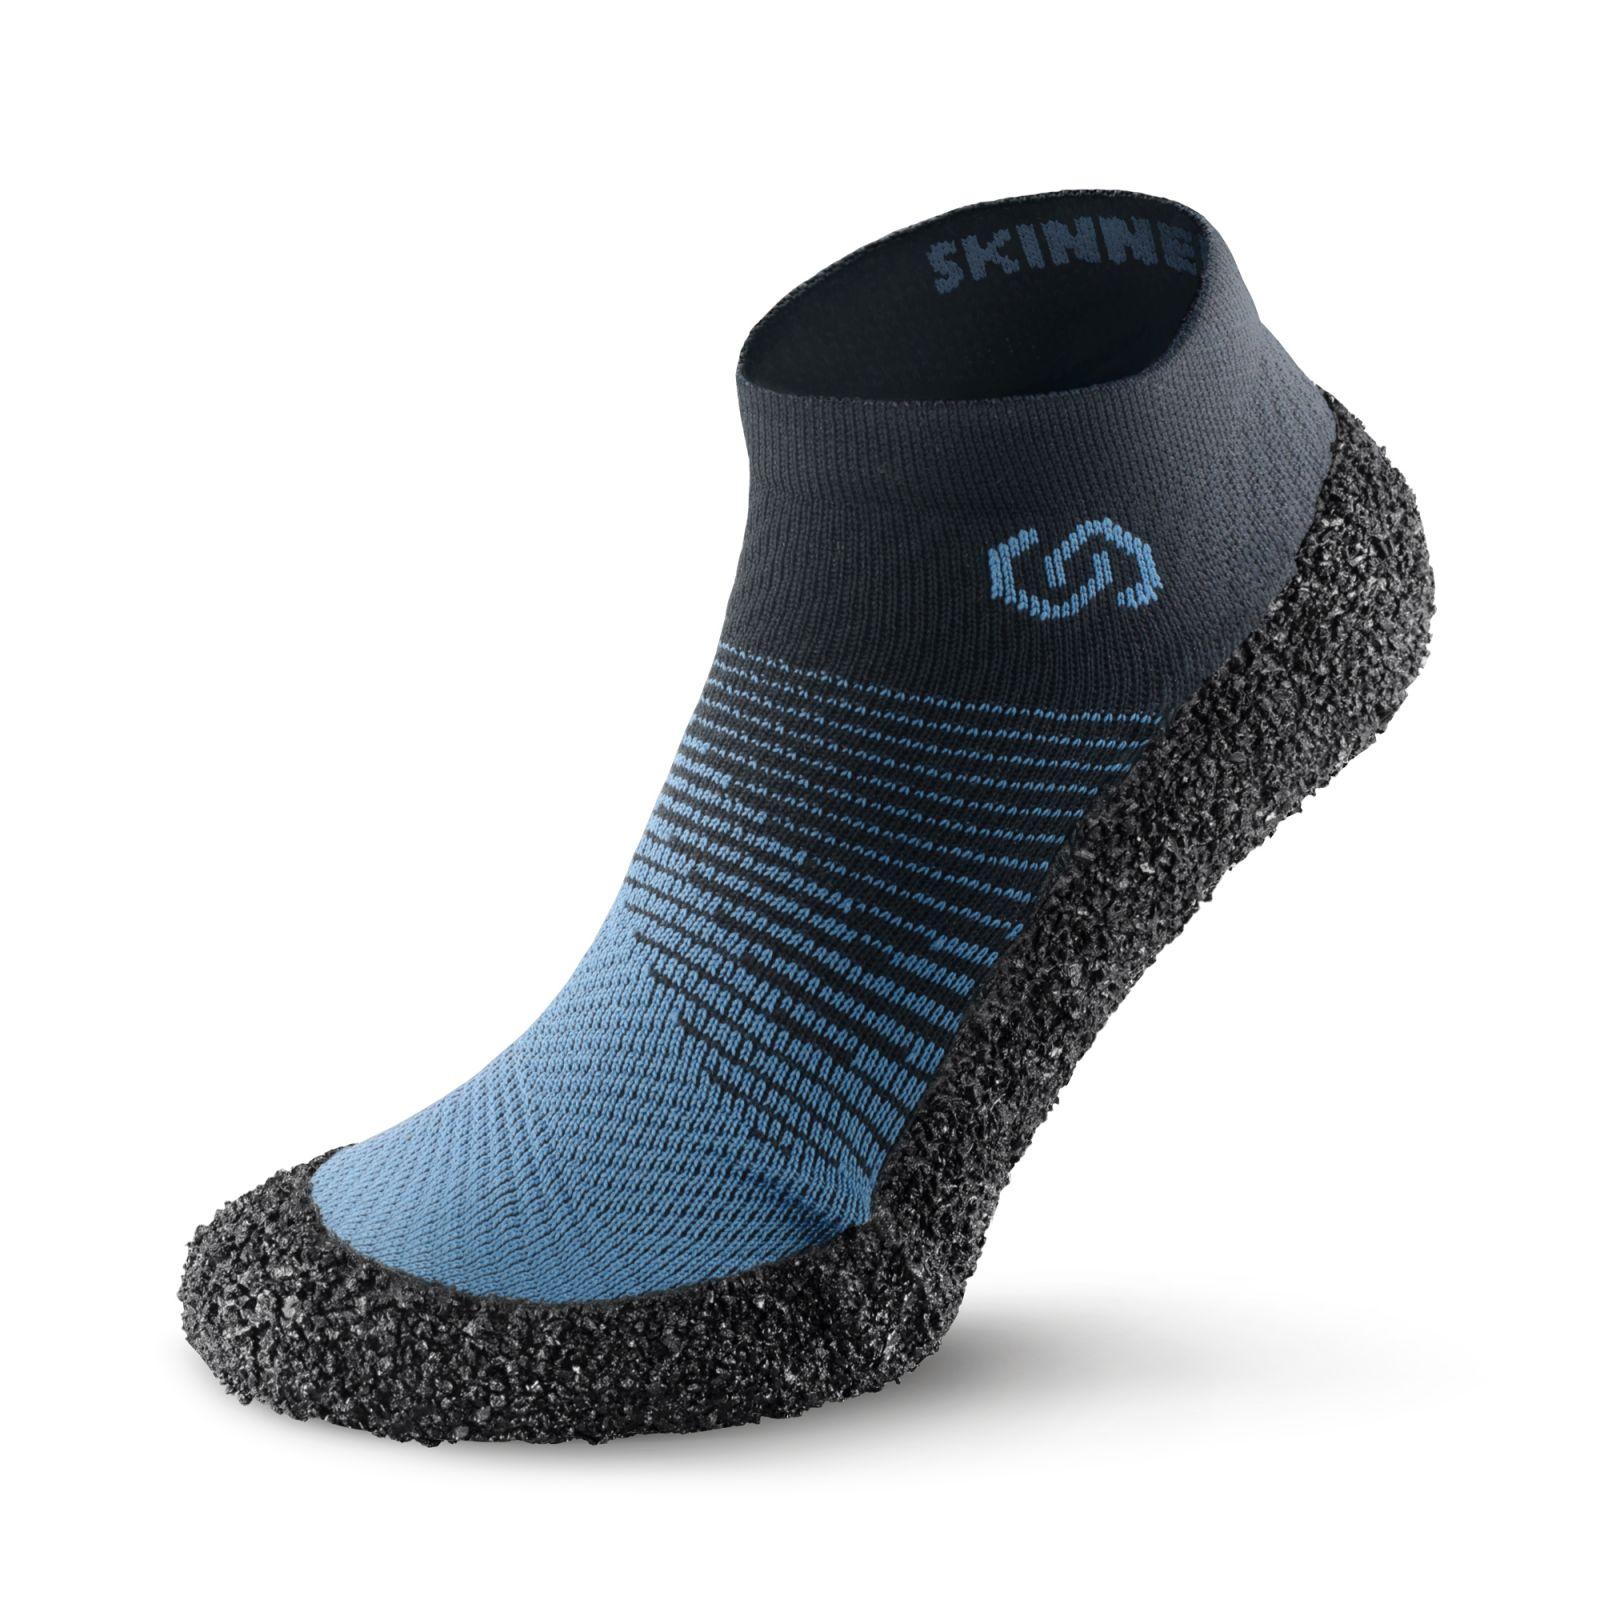 Ponožkoboty SKINNERS 2.0, Marine